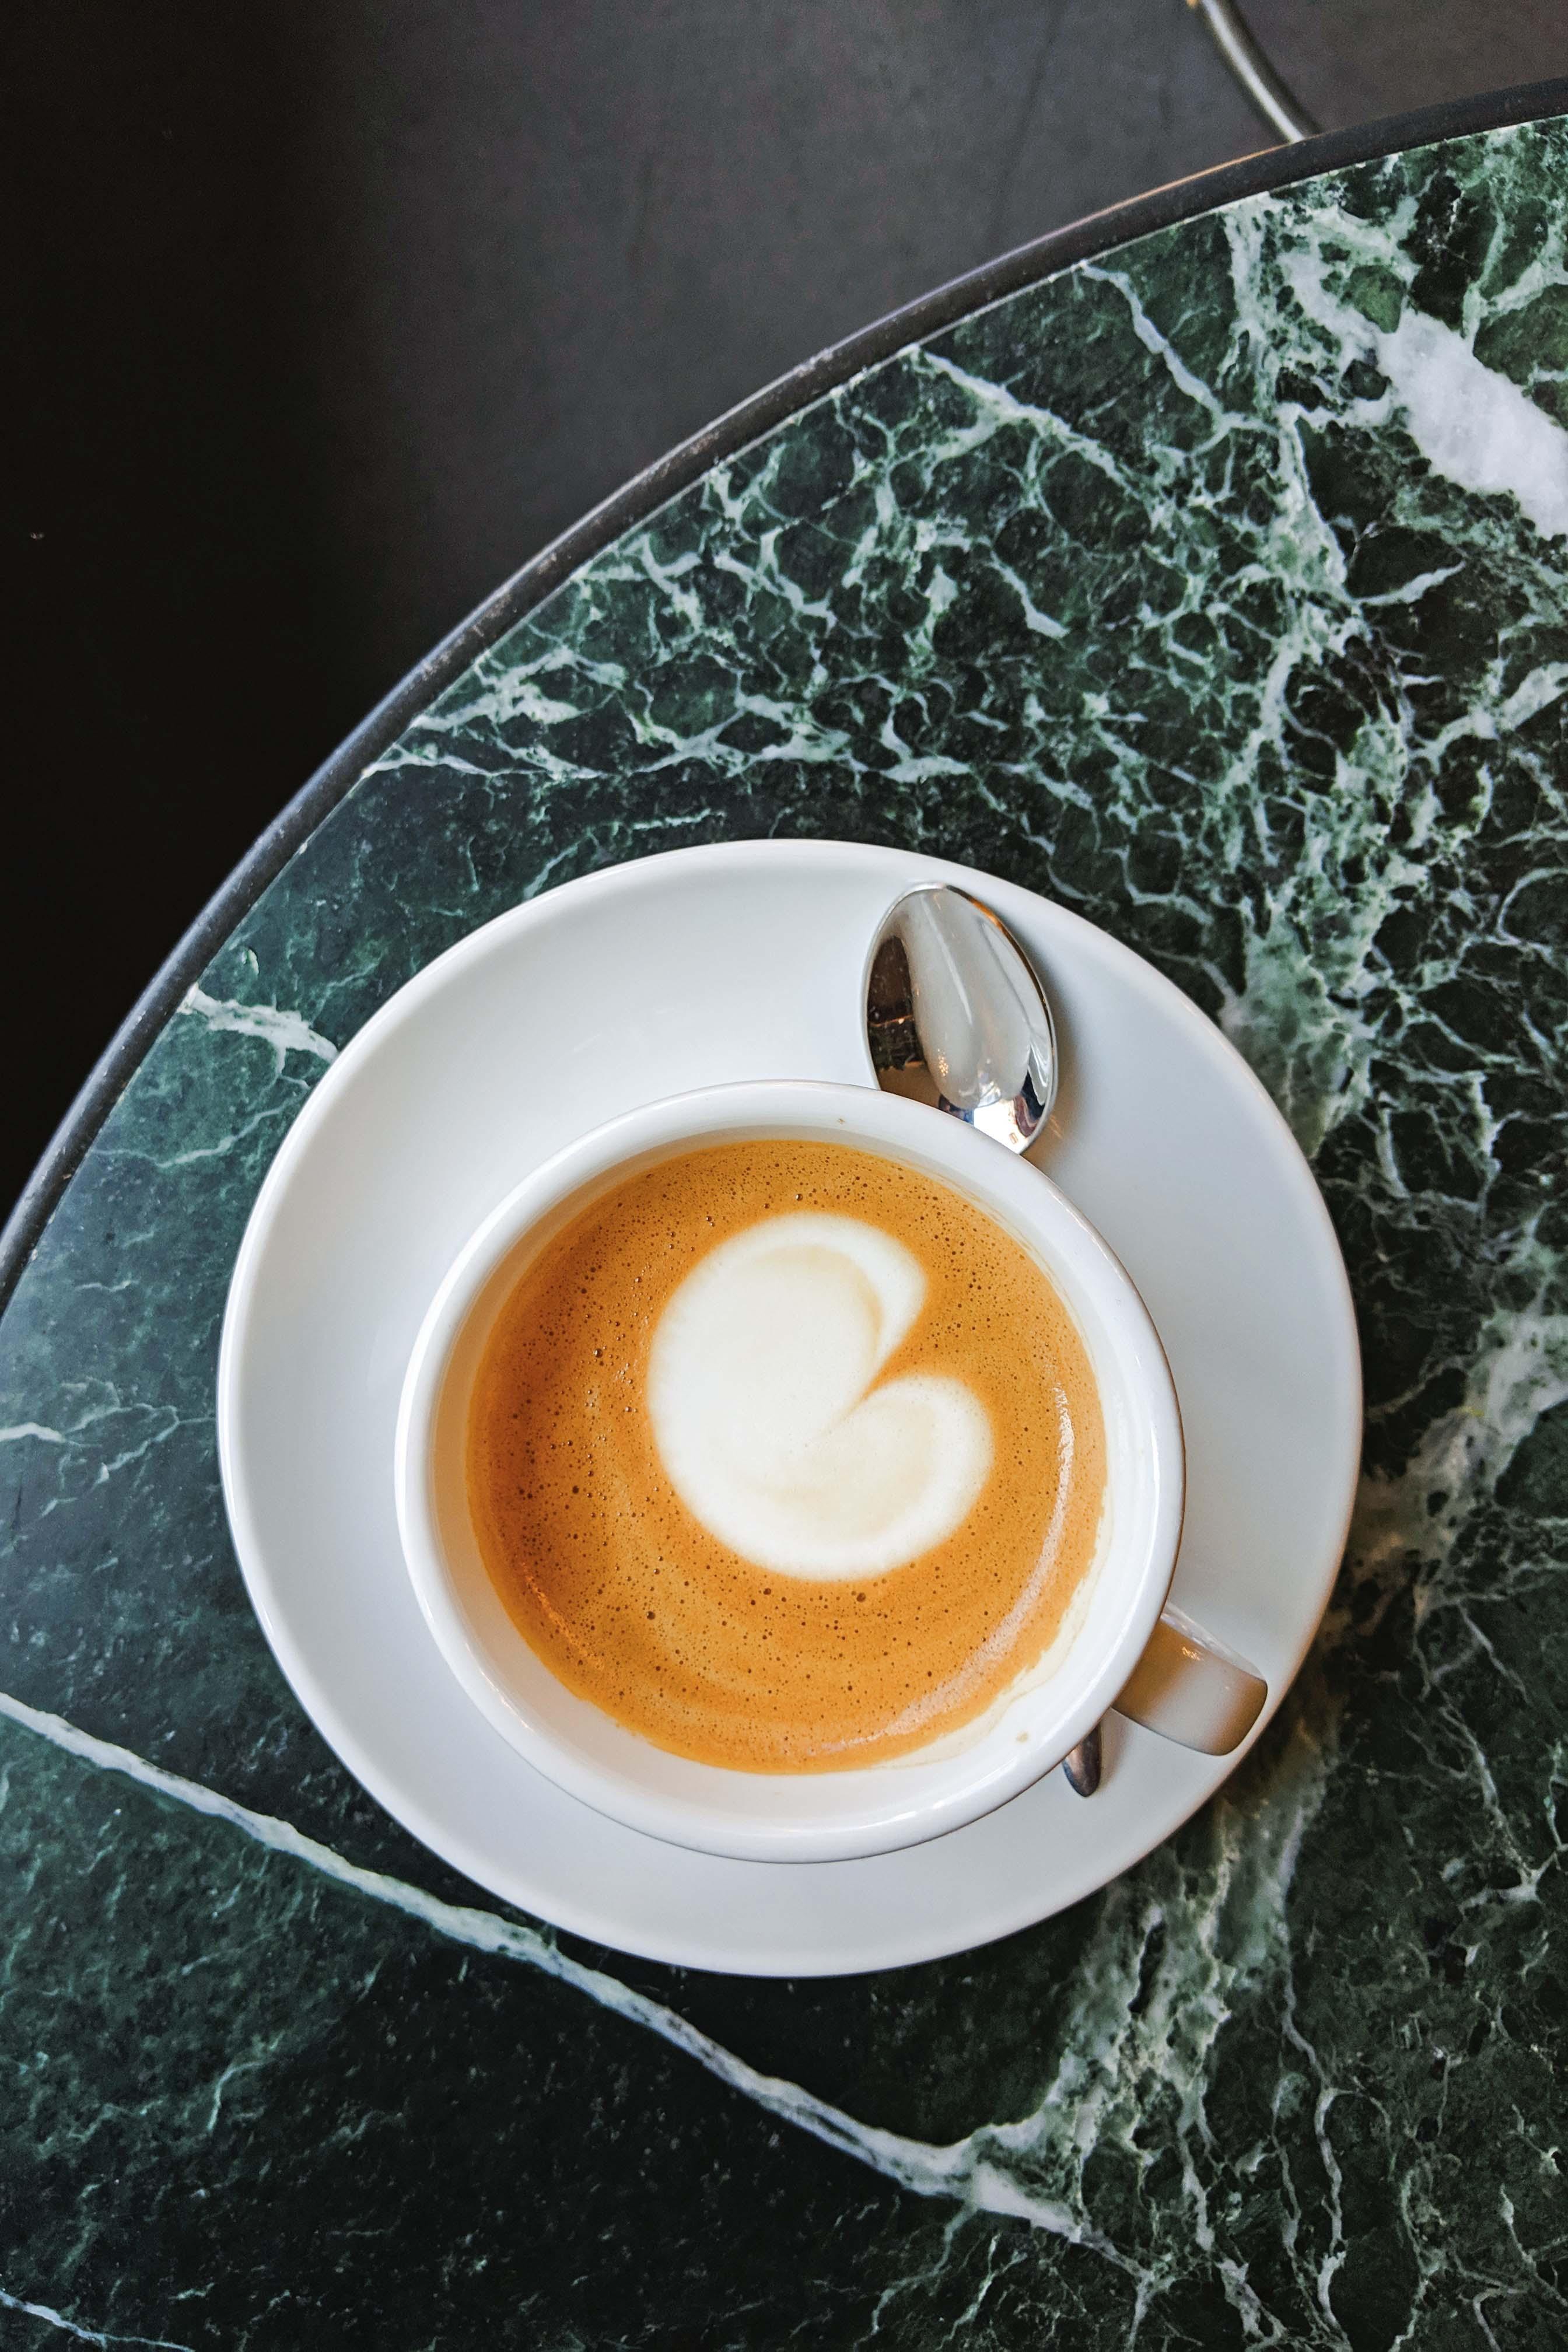 Cortado a Workshop Coffee, The Pilgrim Hotel, London